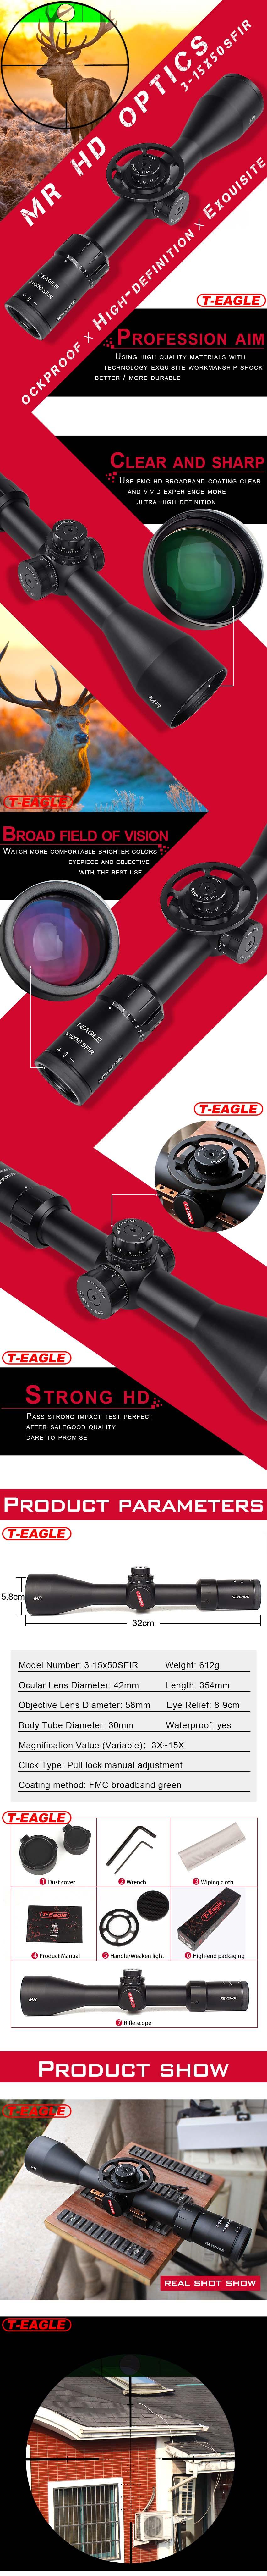 Best Rifle Scope T-Eagle MR 3-15X50 SFIR Optic Sight Scopes pic-1